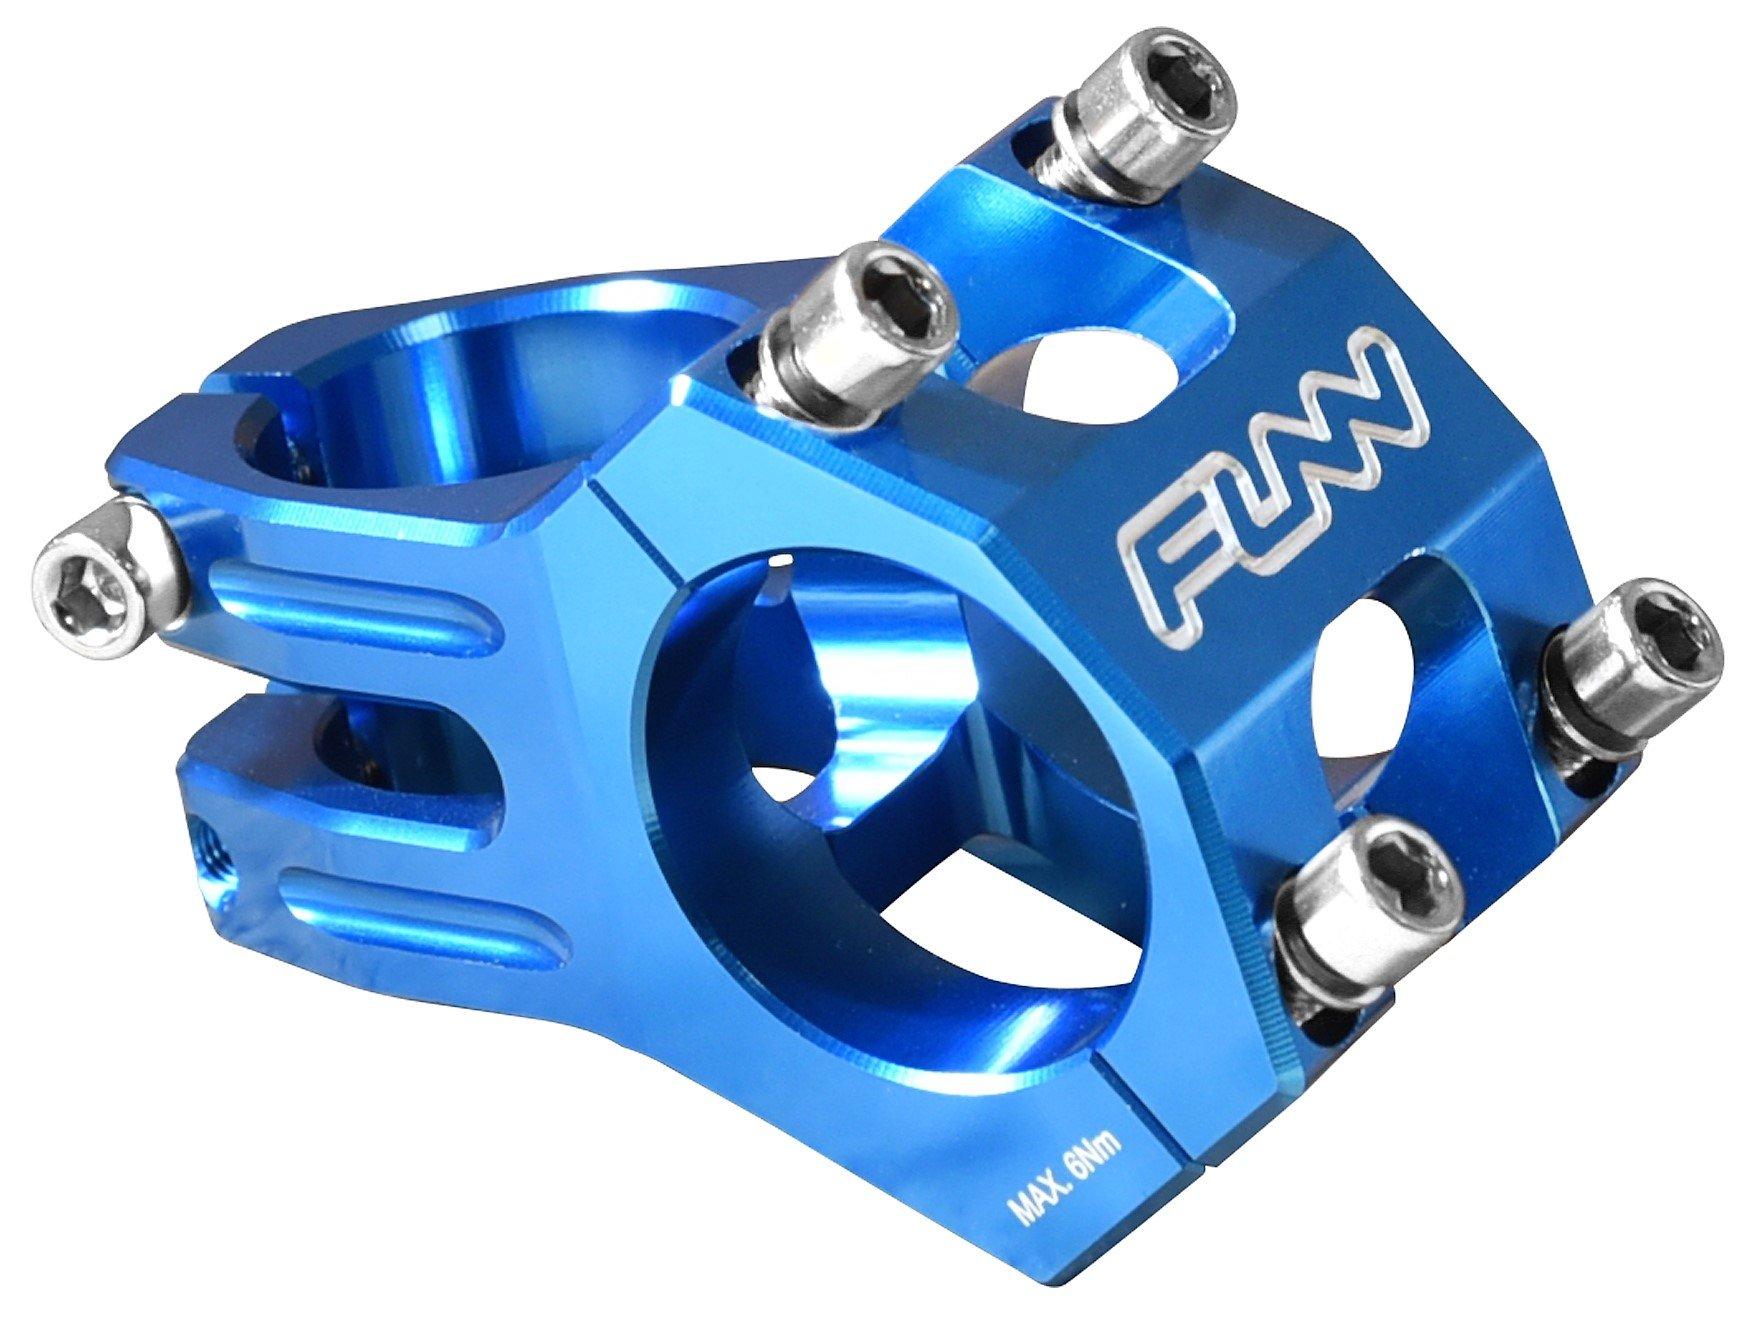 Funn Funnduro MTB Stem, Bar Clamp 31.8mm (Length 45mm, Blue) by Funn